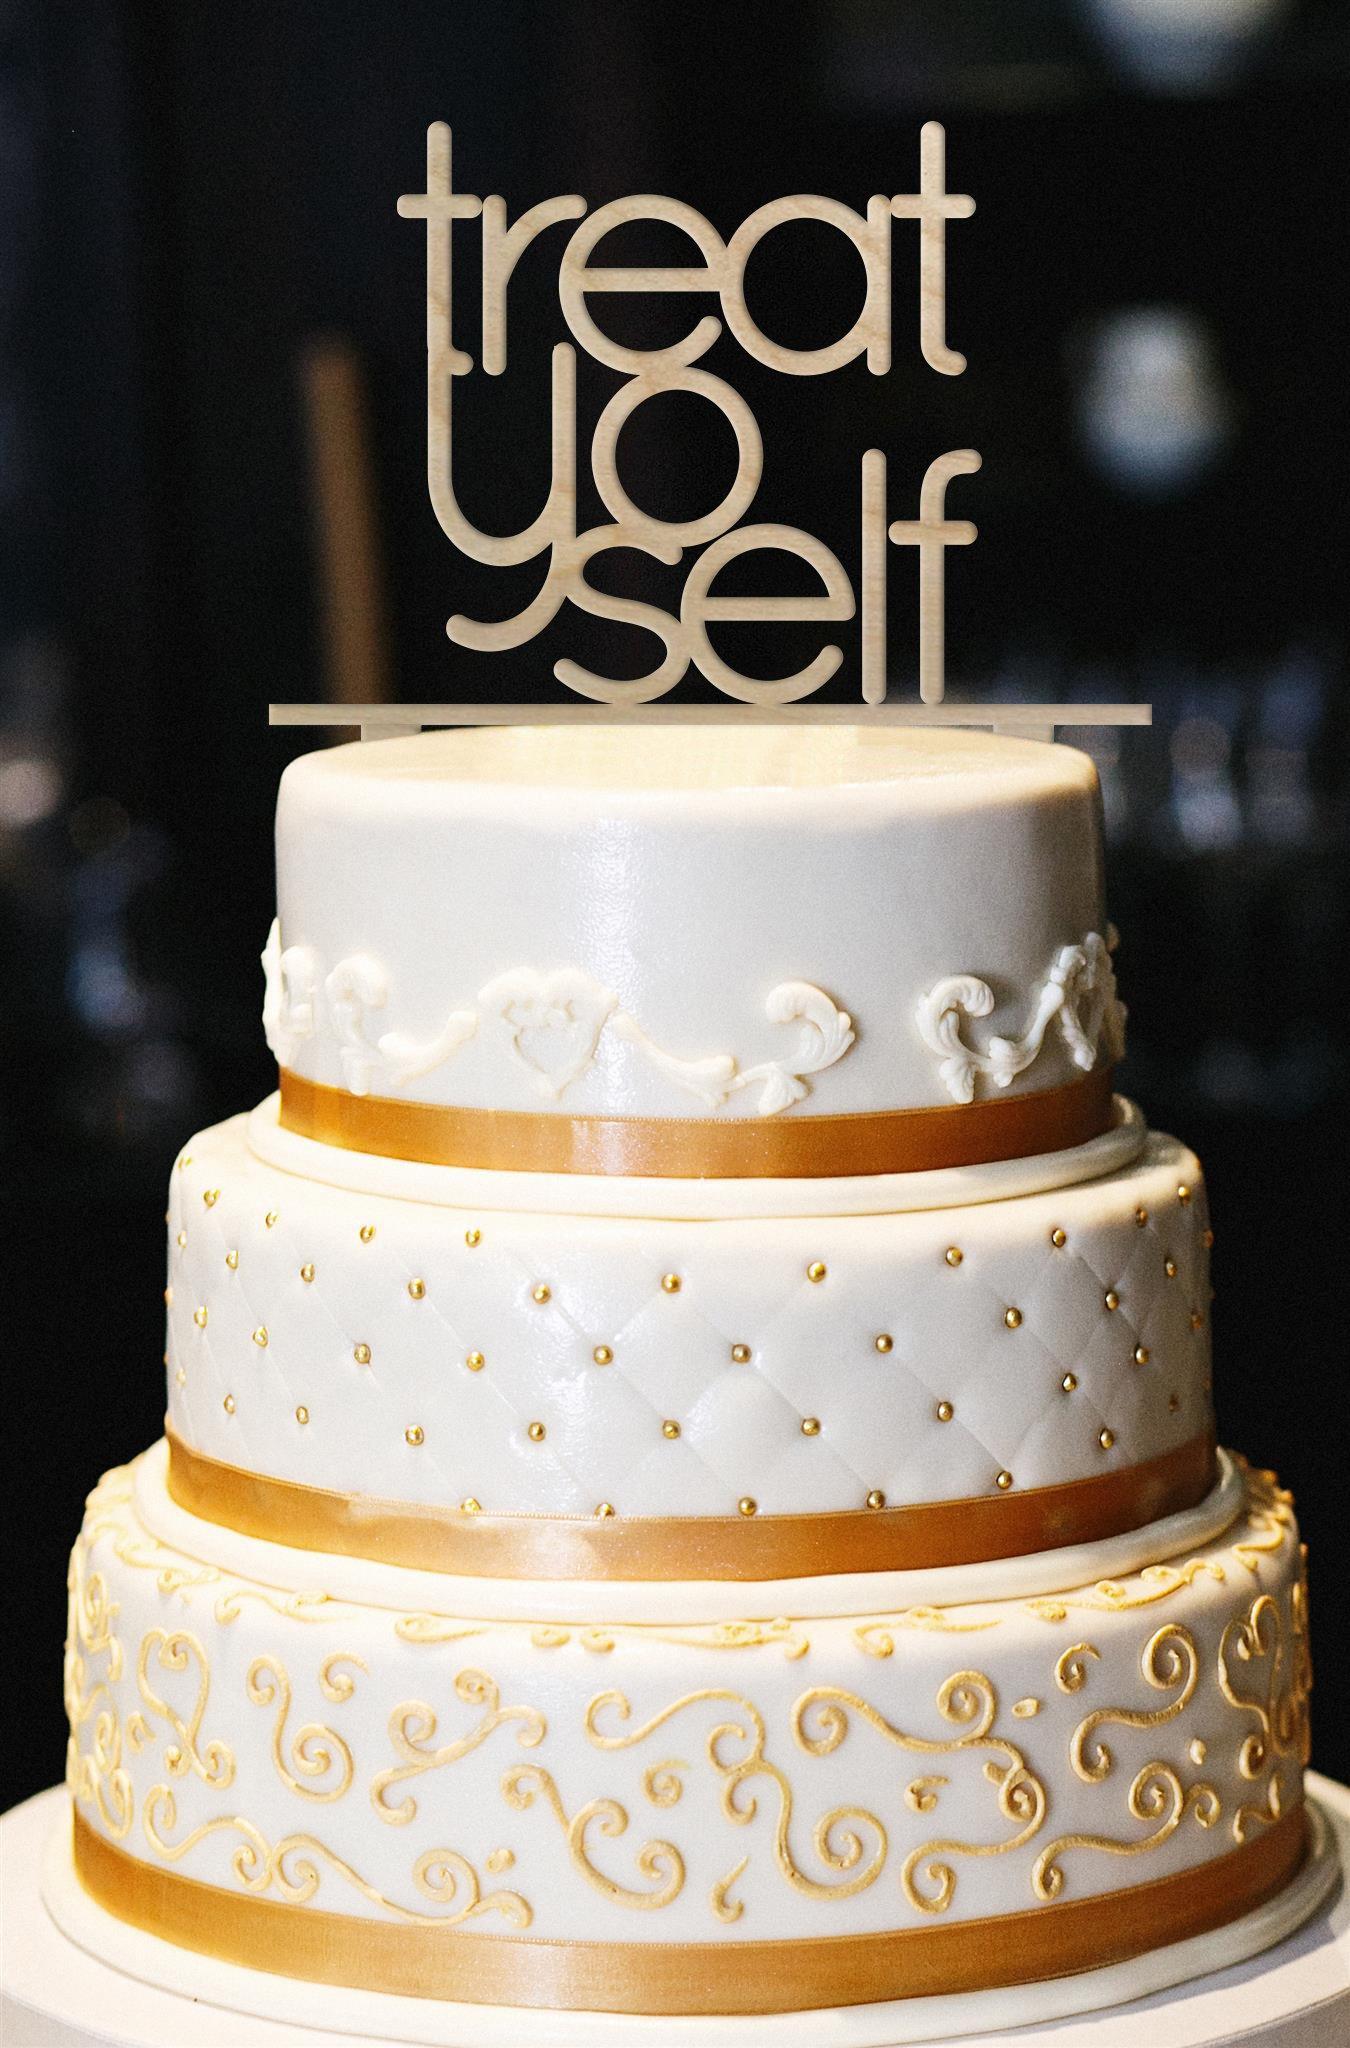 Treat Yo Self Cake Topper, Wood Birthday Cake Topper, Birthday Party Cake Topper, Wood Cake Topper (6'')